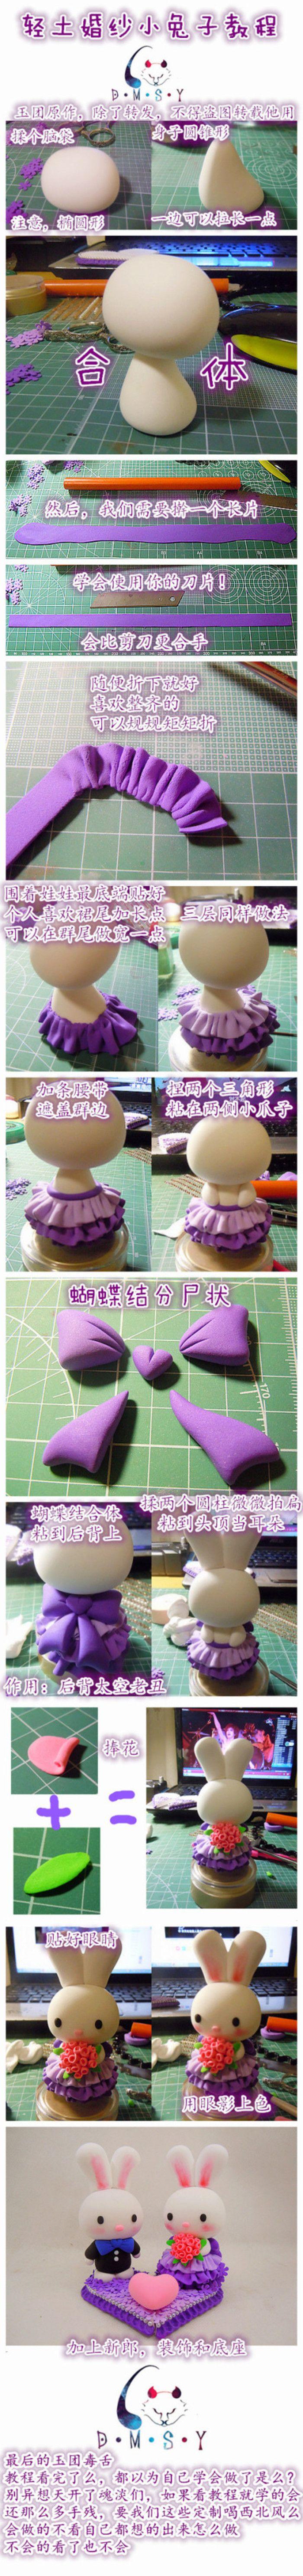 Cute little bunny DIY clay